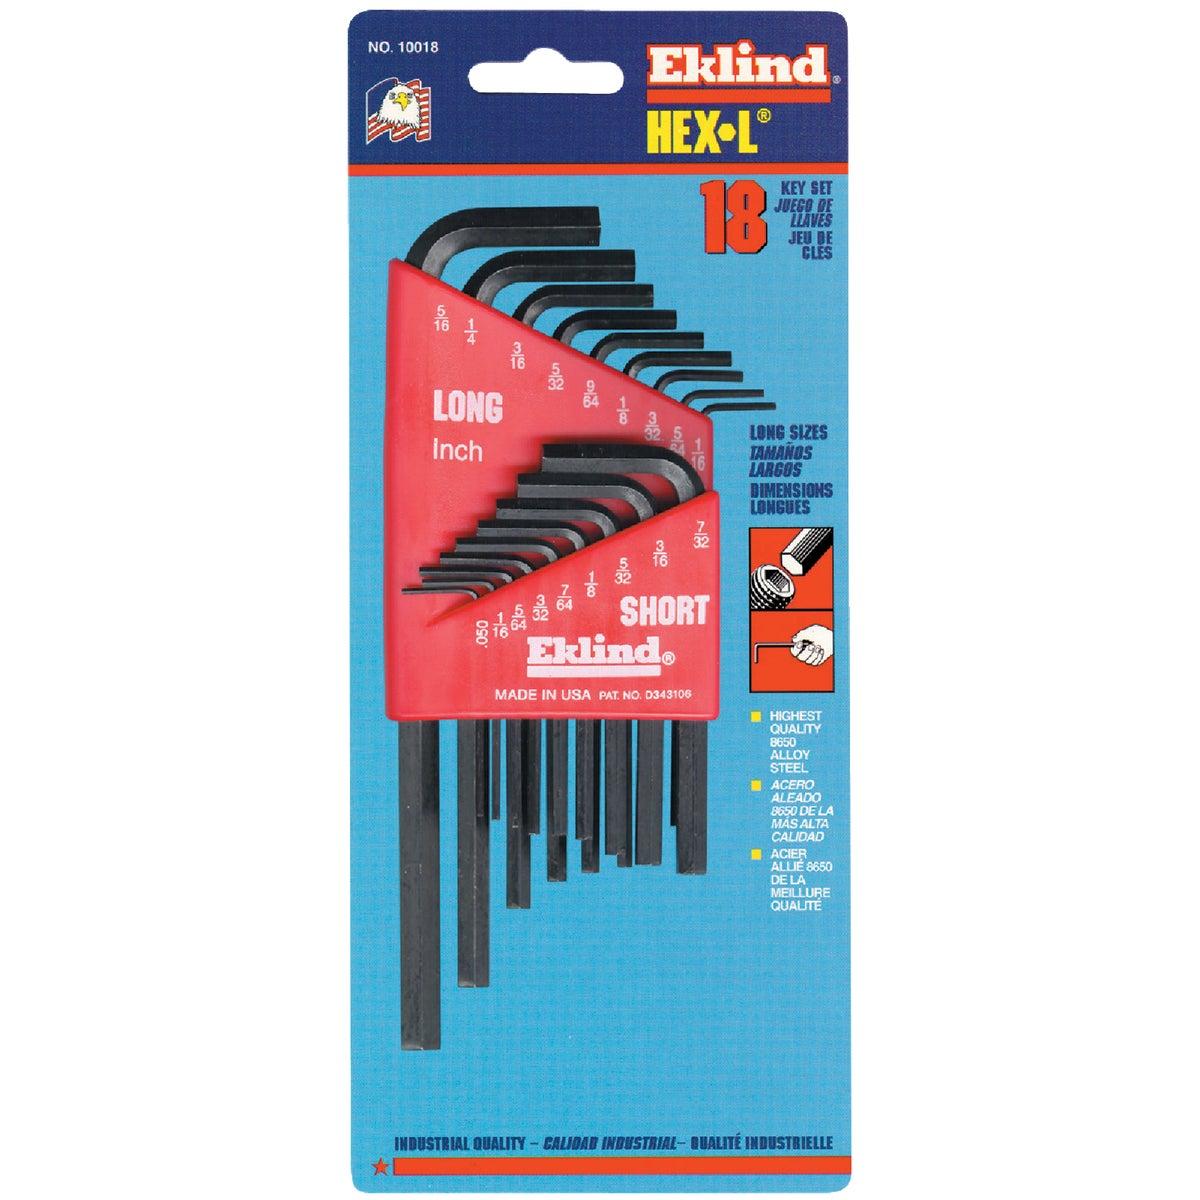 Eklind Combination Hex Key Set, 18-Piece